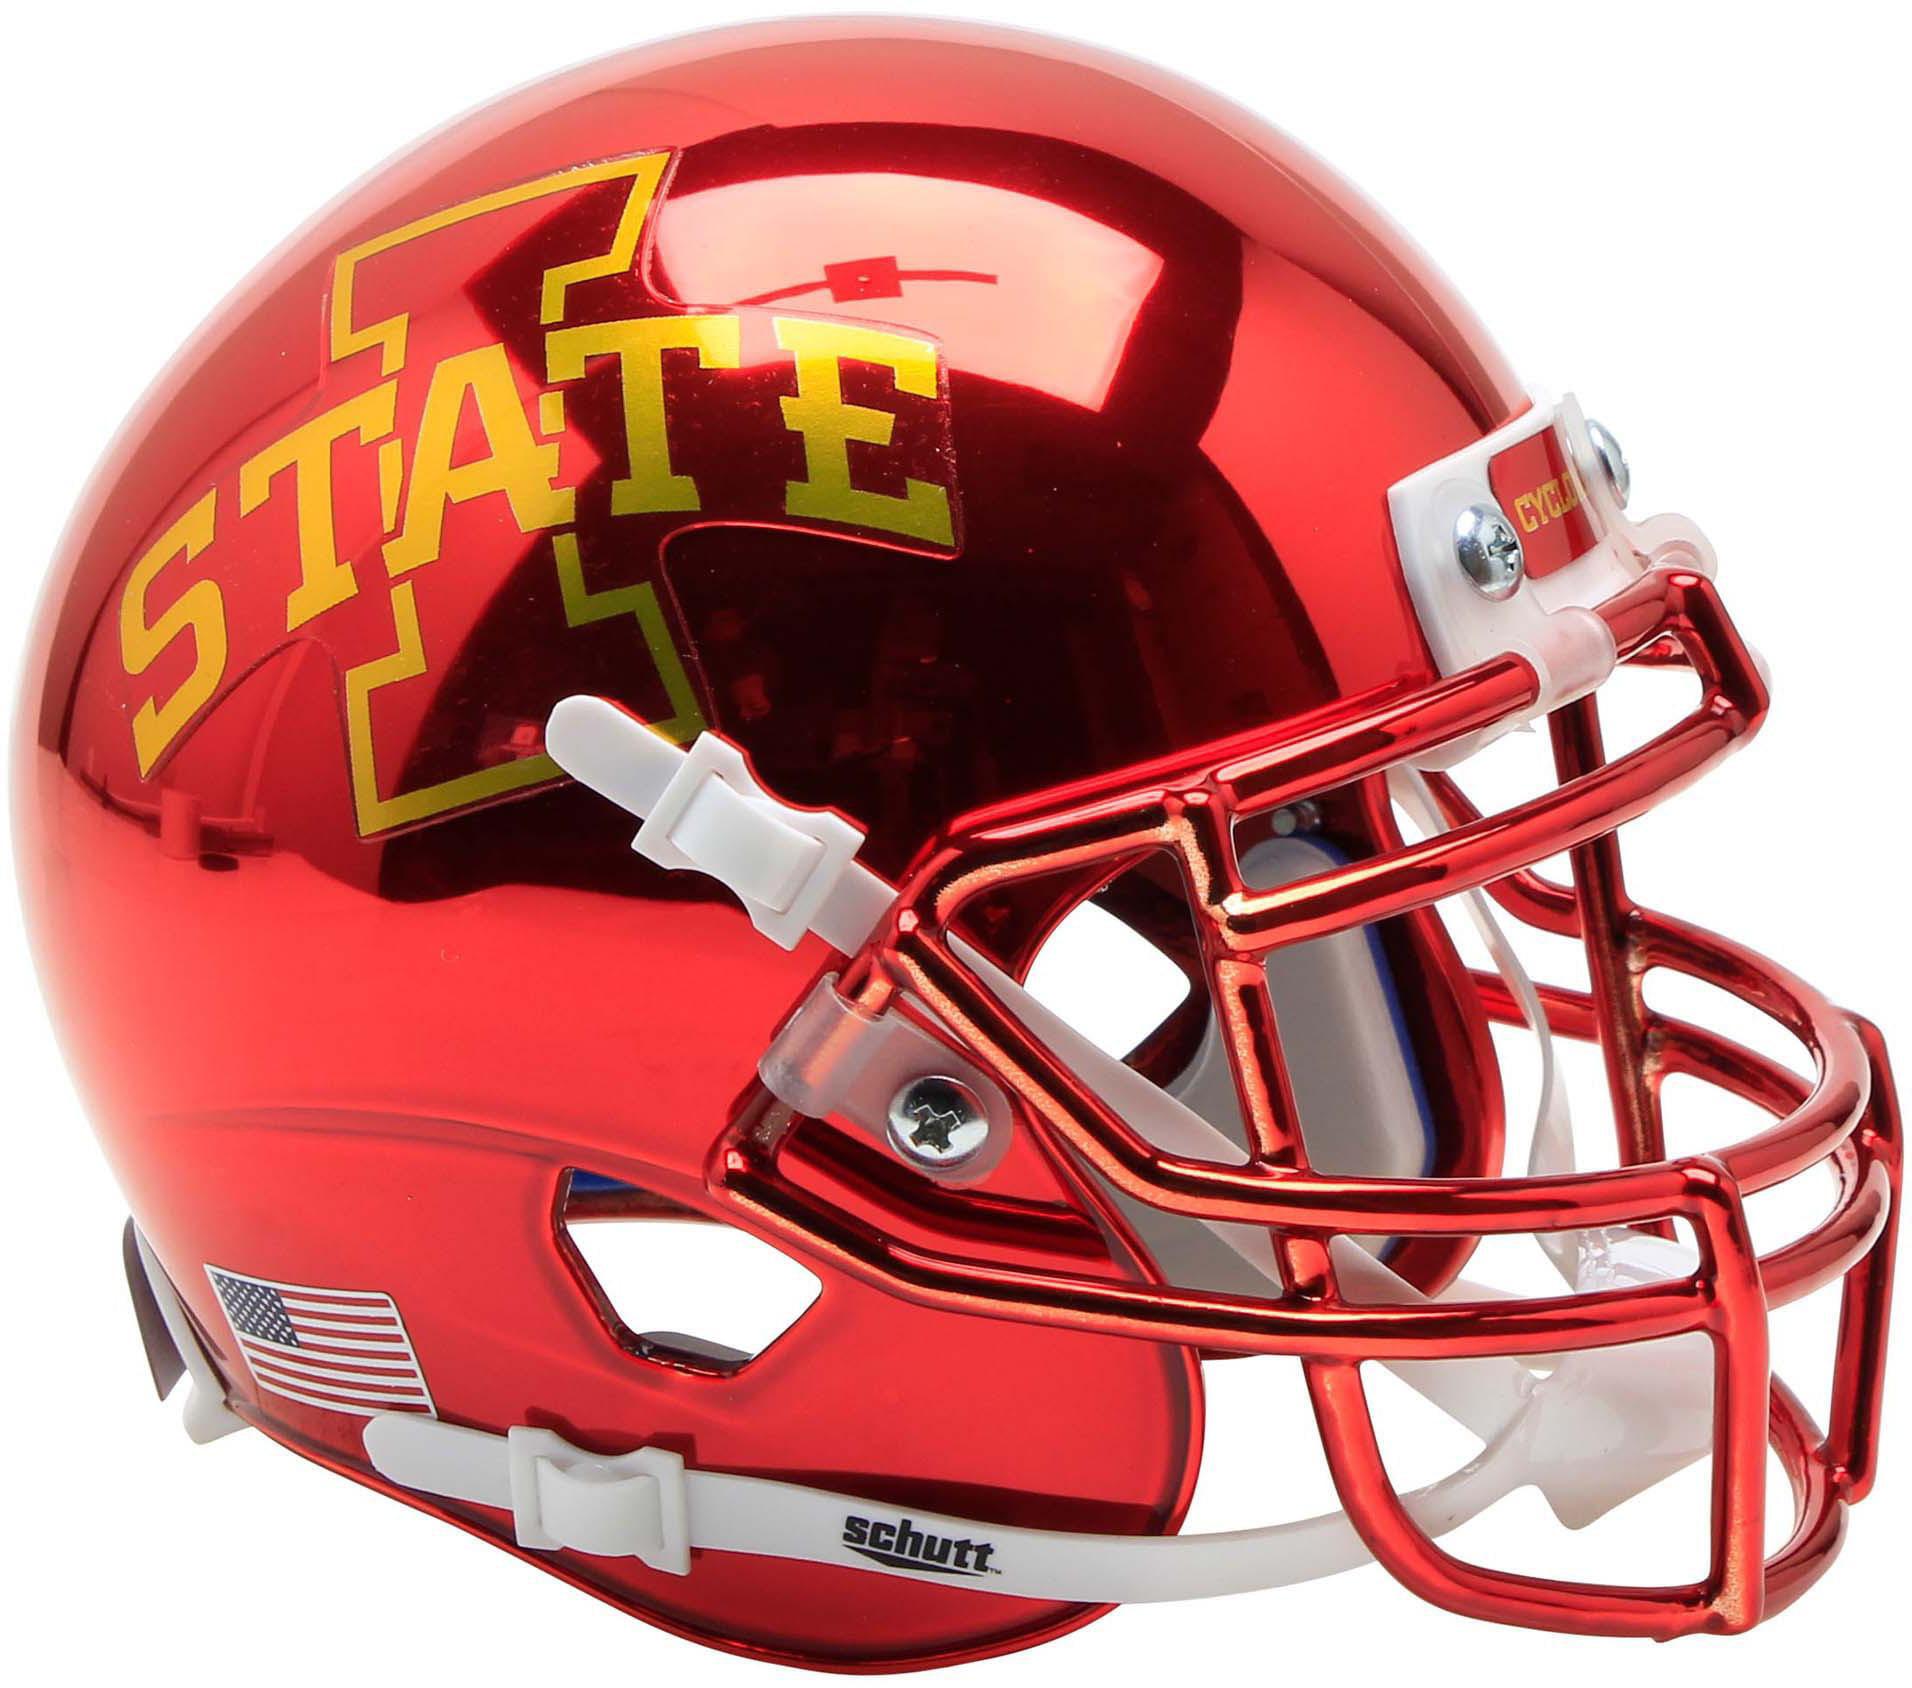 Fanatics Authentic Iowa State Cyclones Schutt Chrome Mini Football Helmet Walmart Com Walmart Com